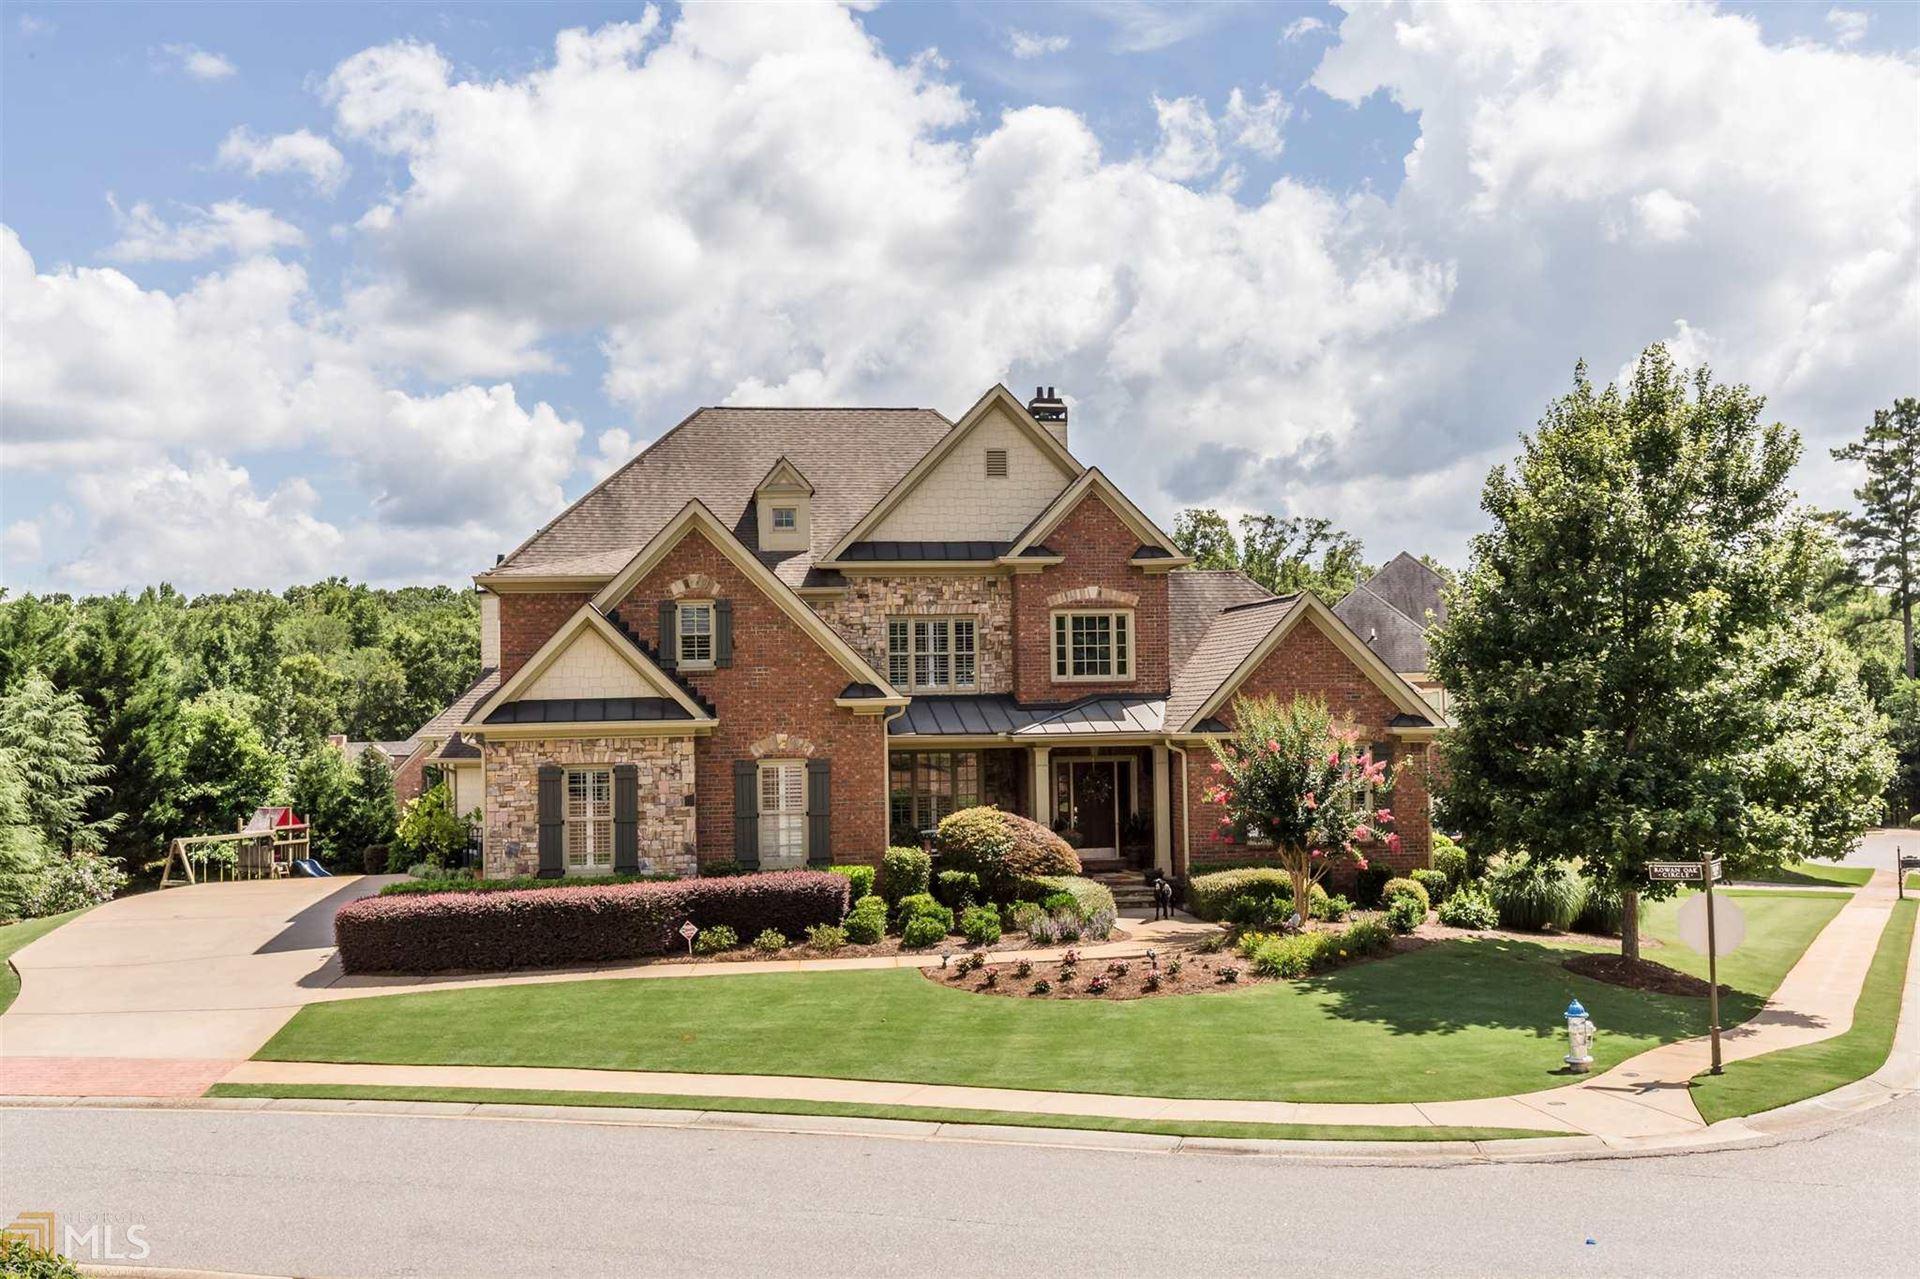 1092 Rowan Oak Cir, Watkinsville, GA 30677 - #: 8762057